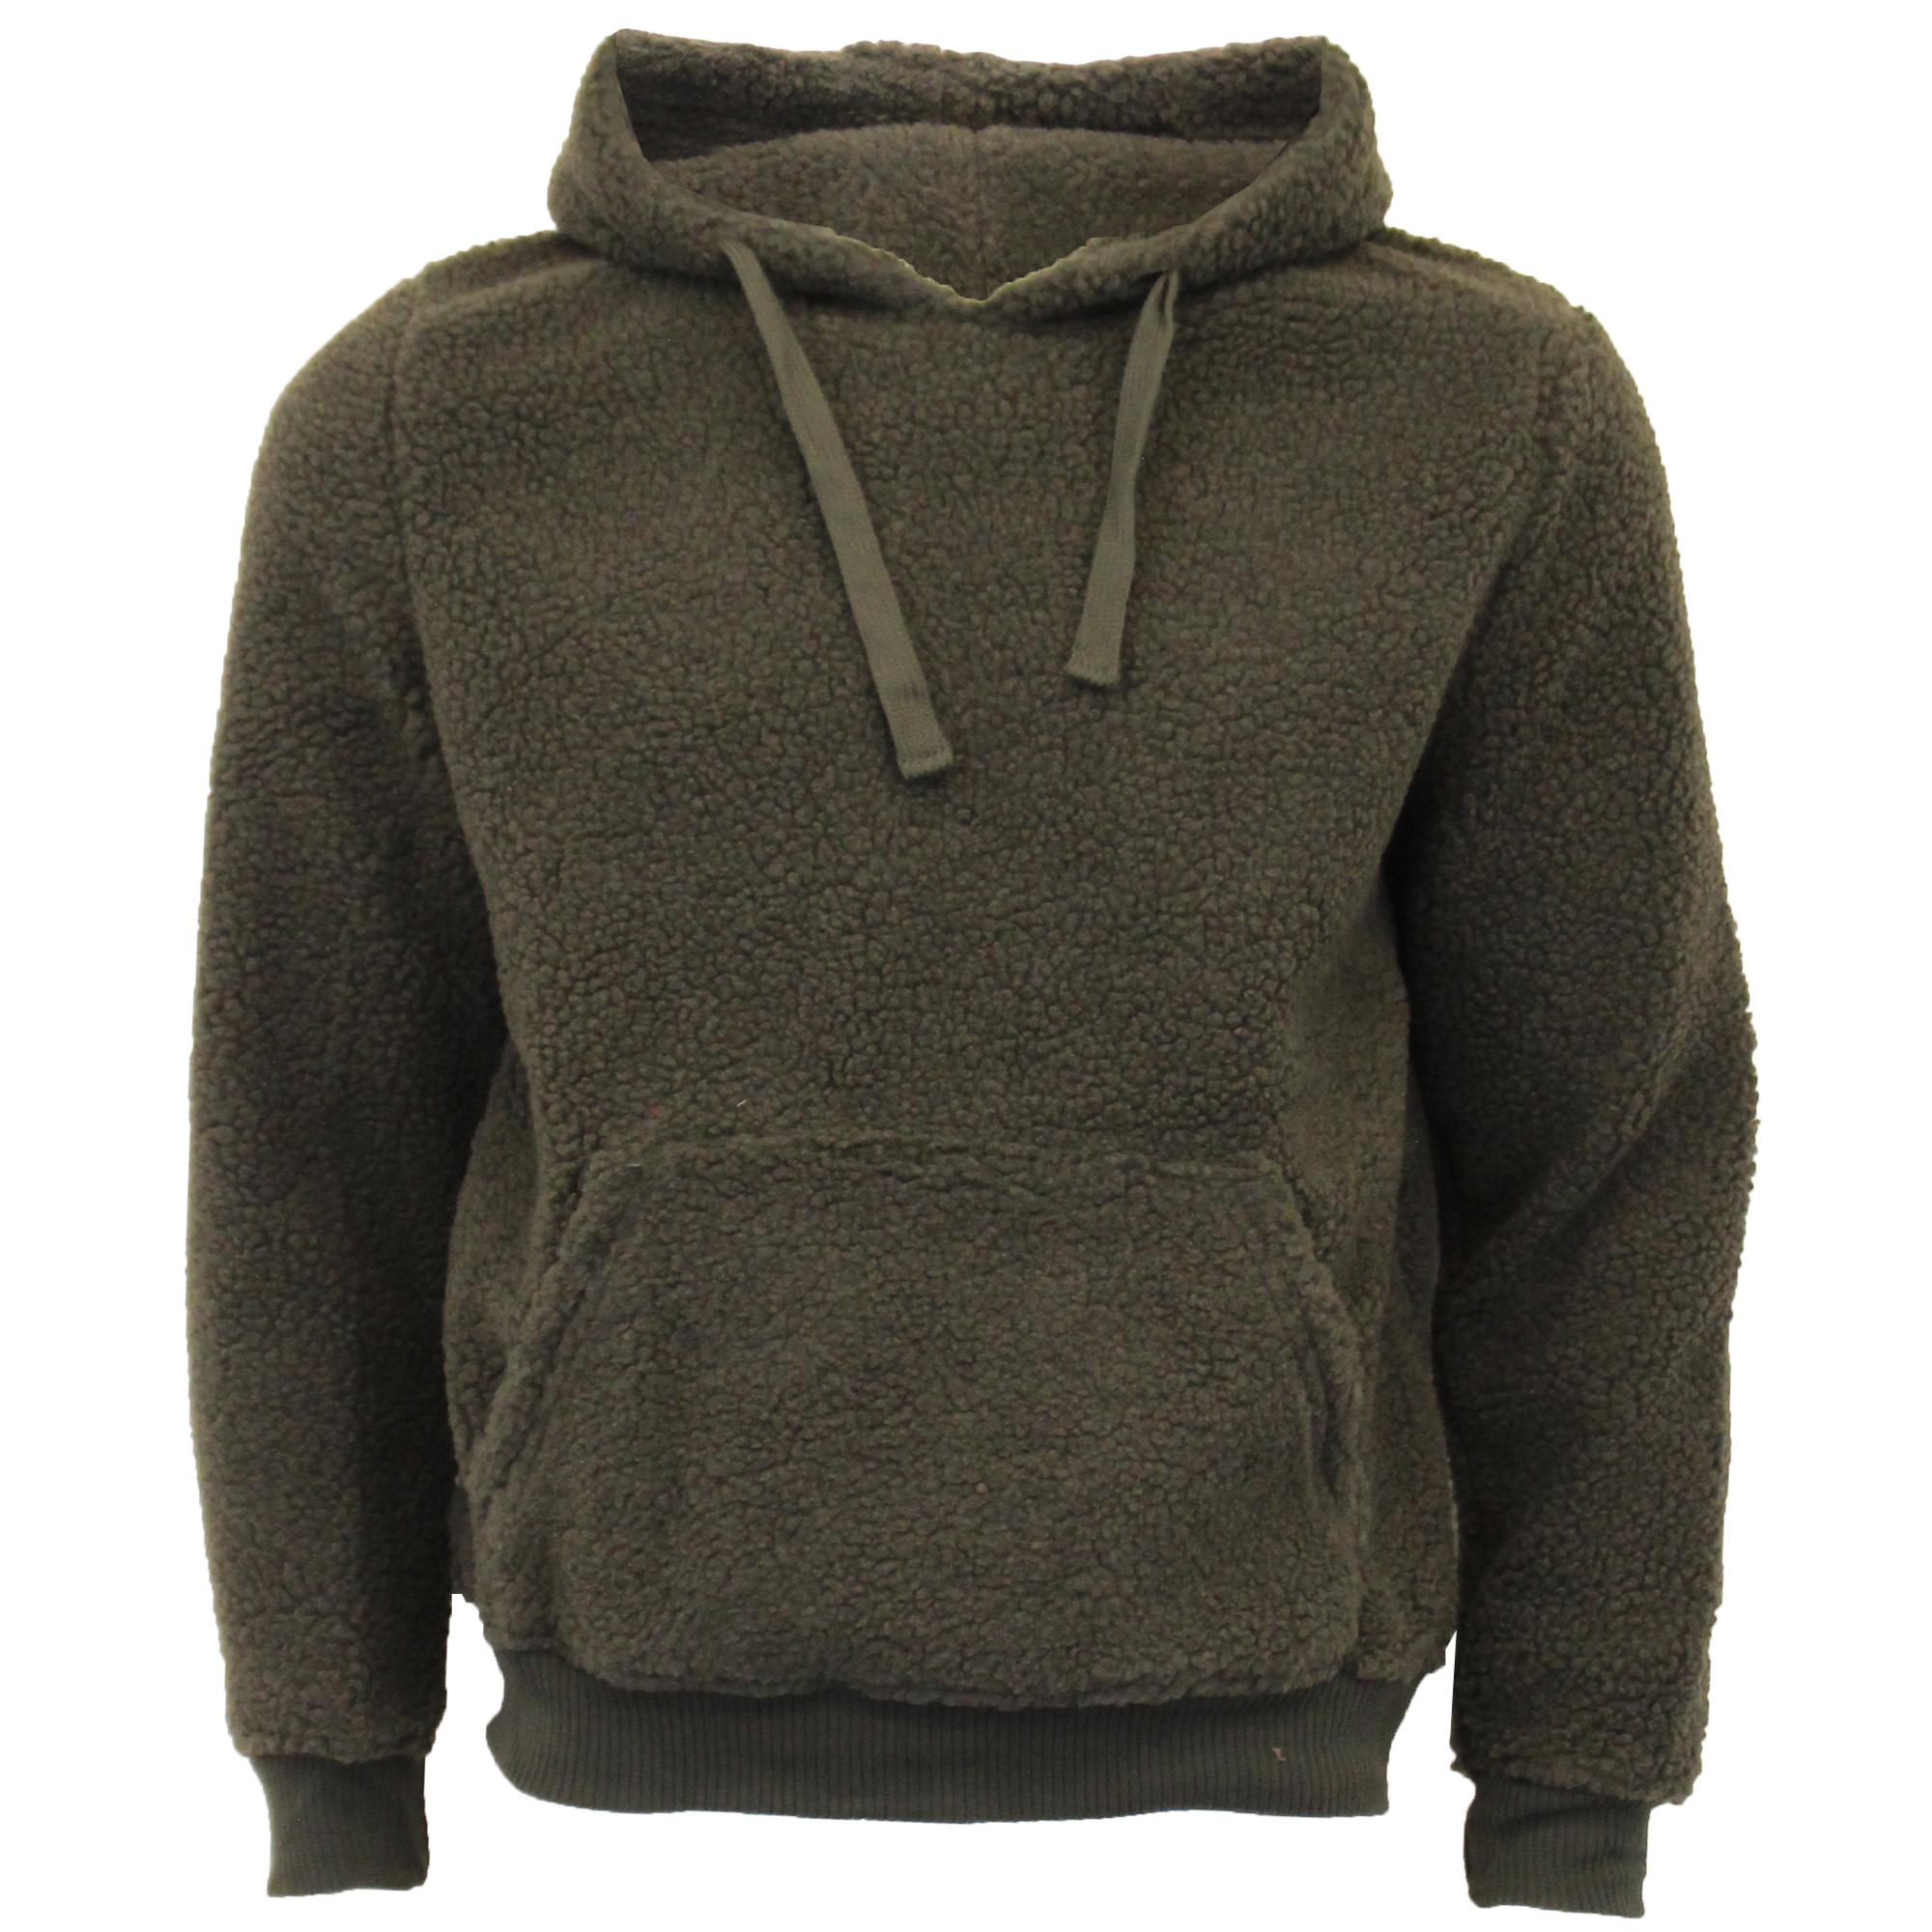 Mens Sherpa Fleece Borg Sweatshirt Brave Soul Over The Head  GROMIT Hooded Top